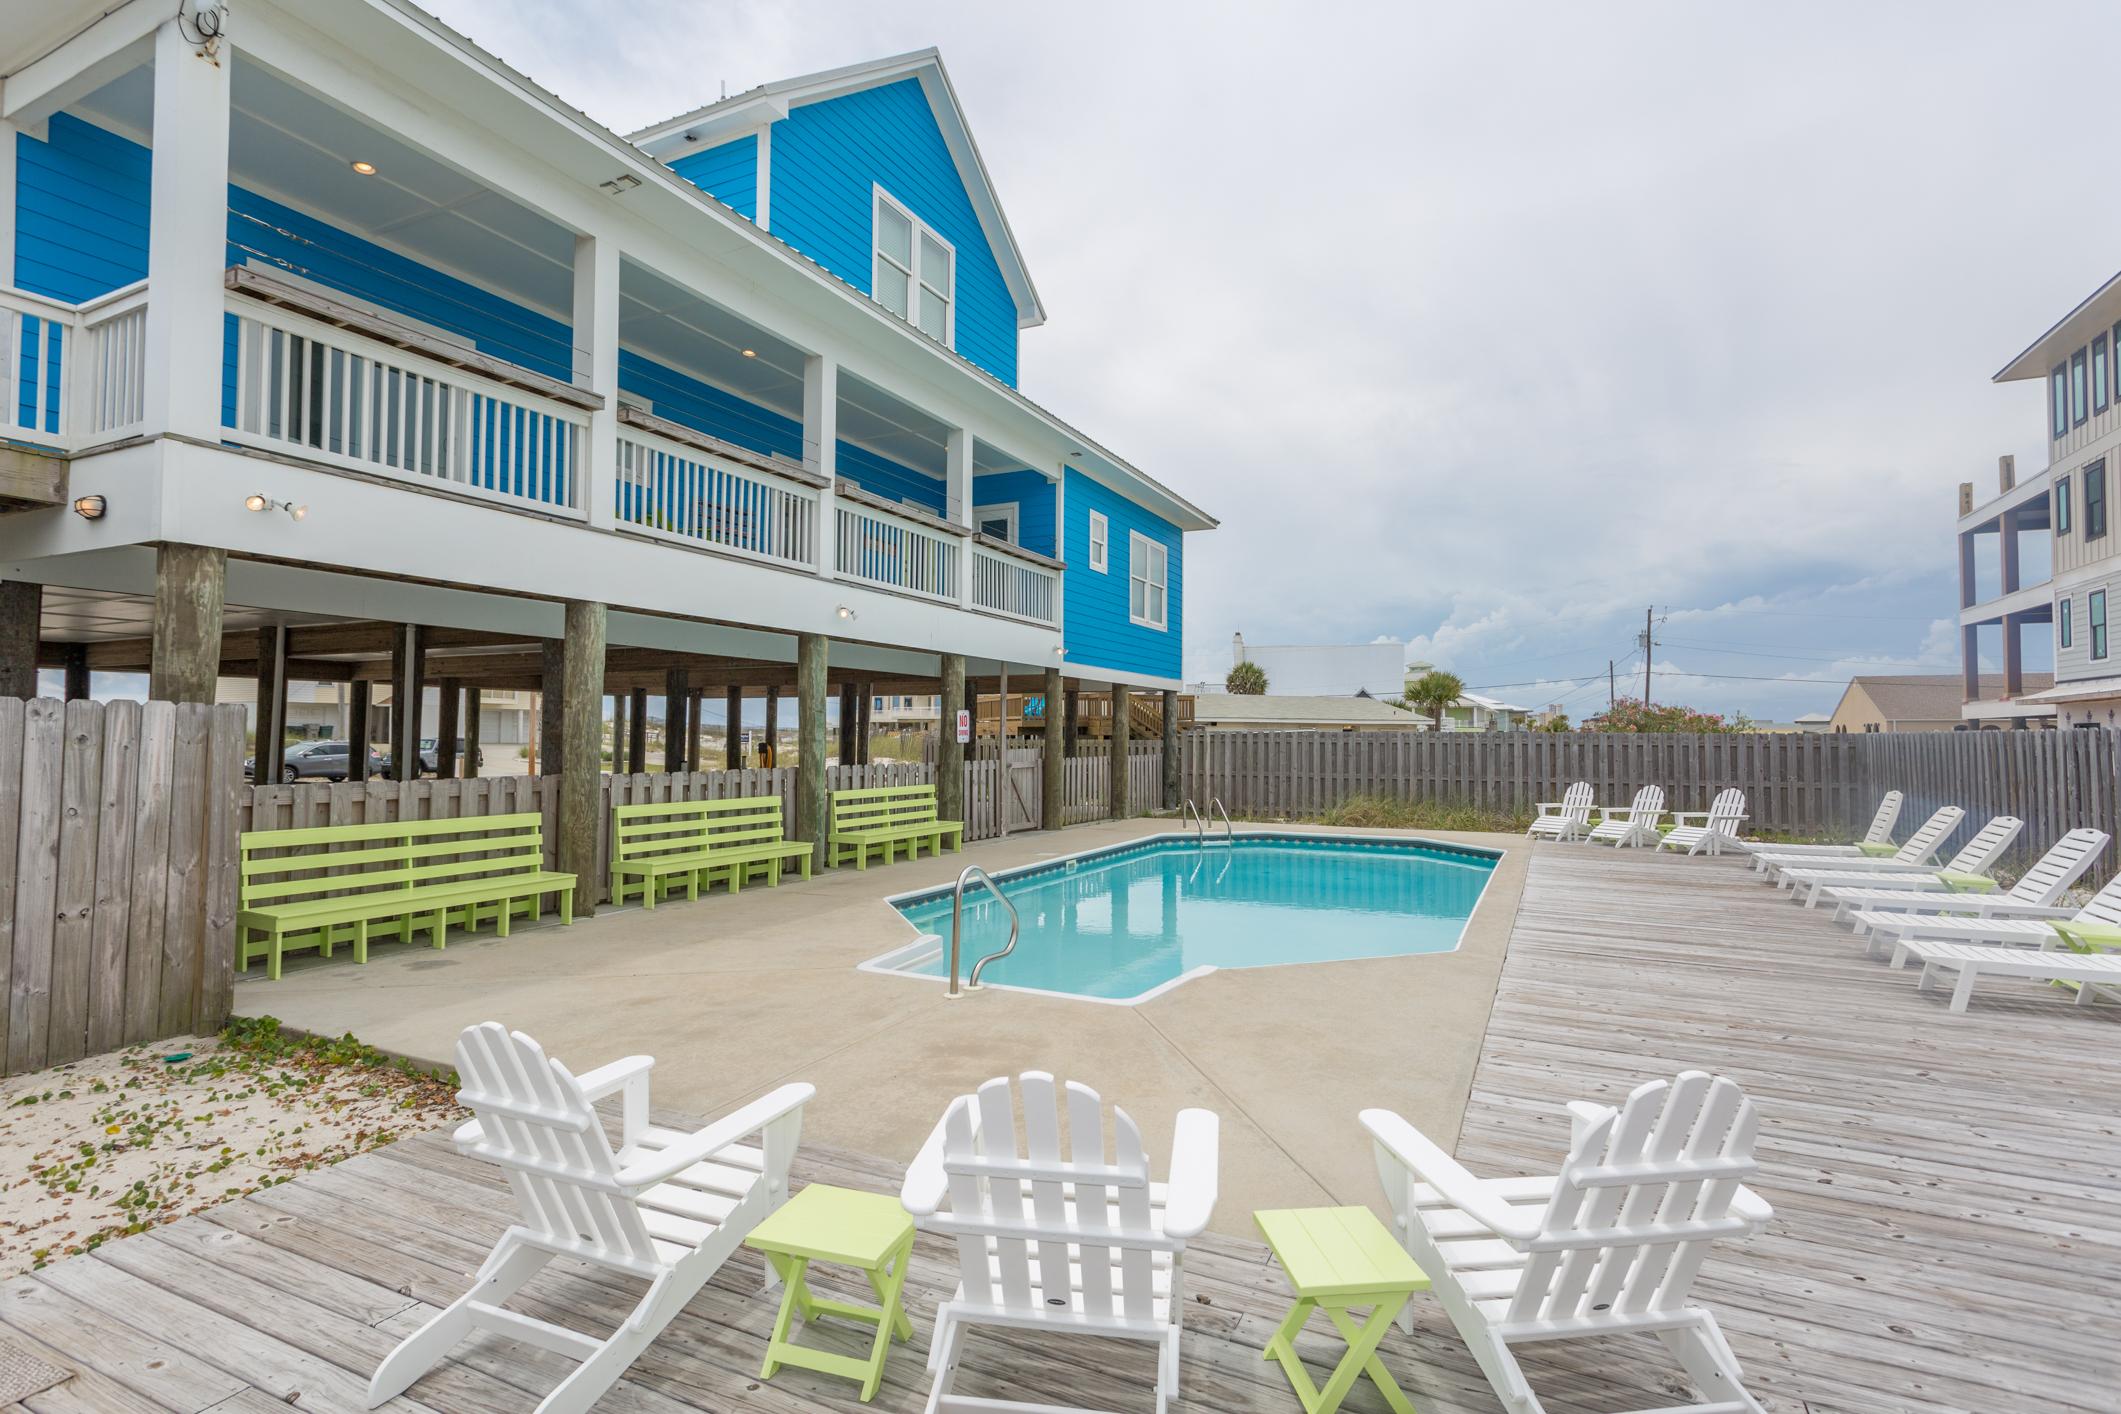 Ariola 1003 - The Starfish House House/Cottage rental in Pensacola Beach House Rentals in Pensacola Beach Florida - #1